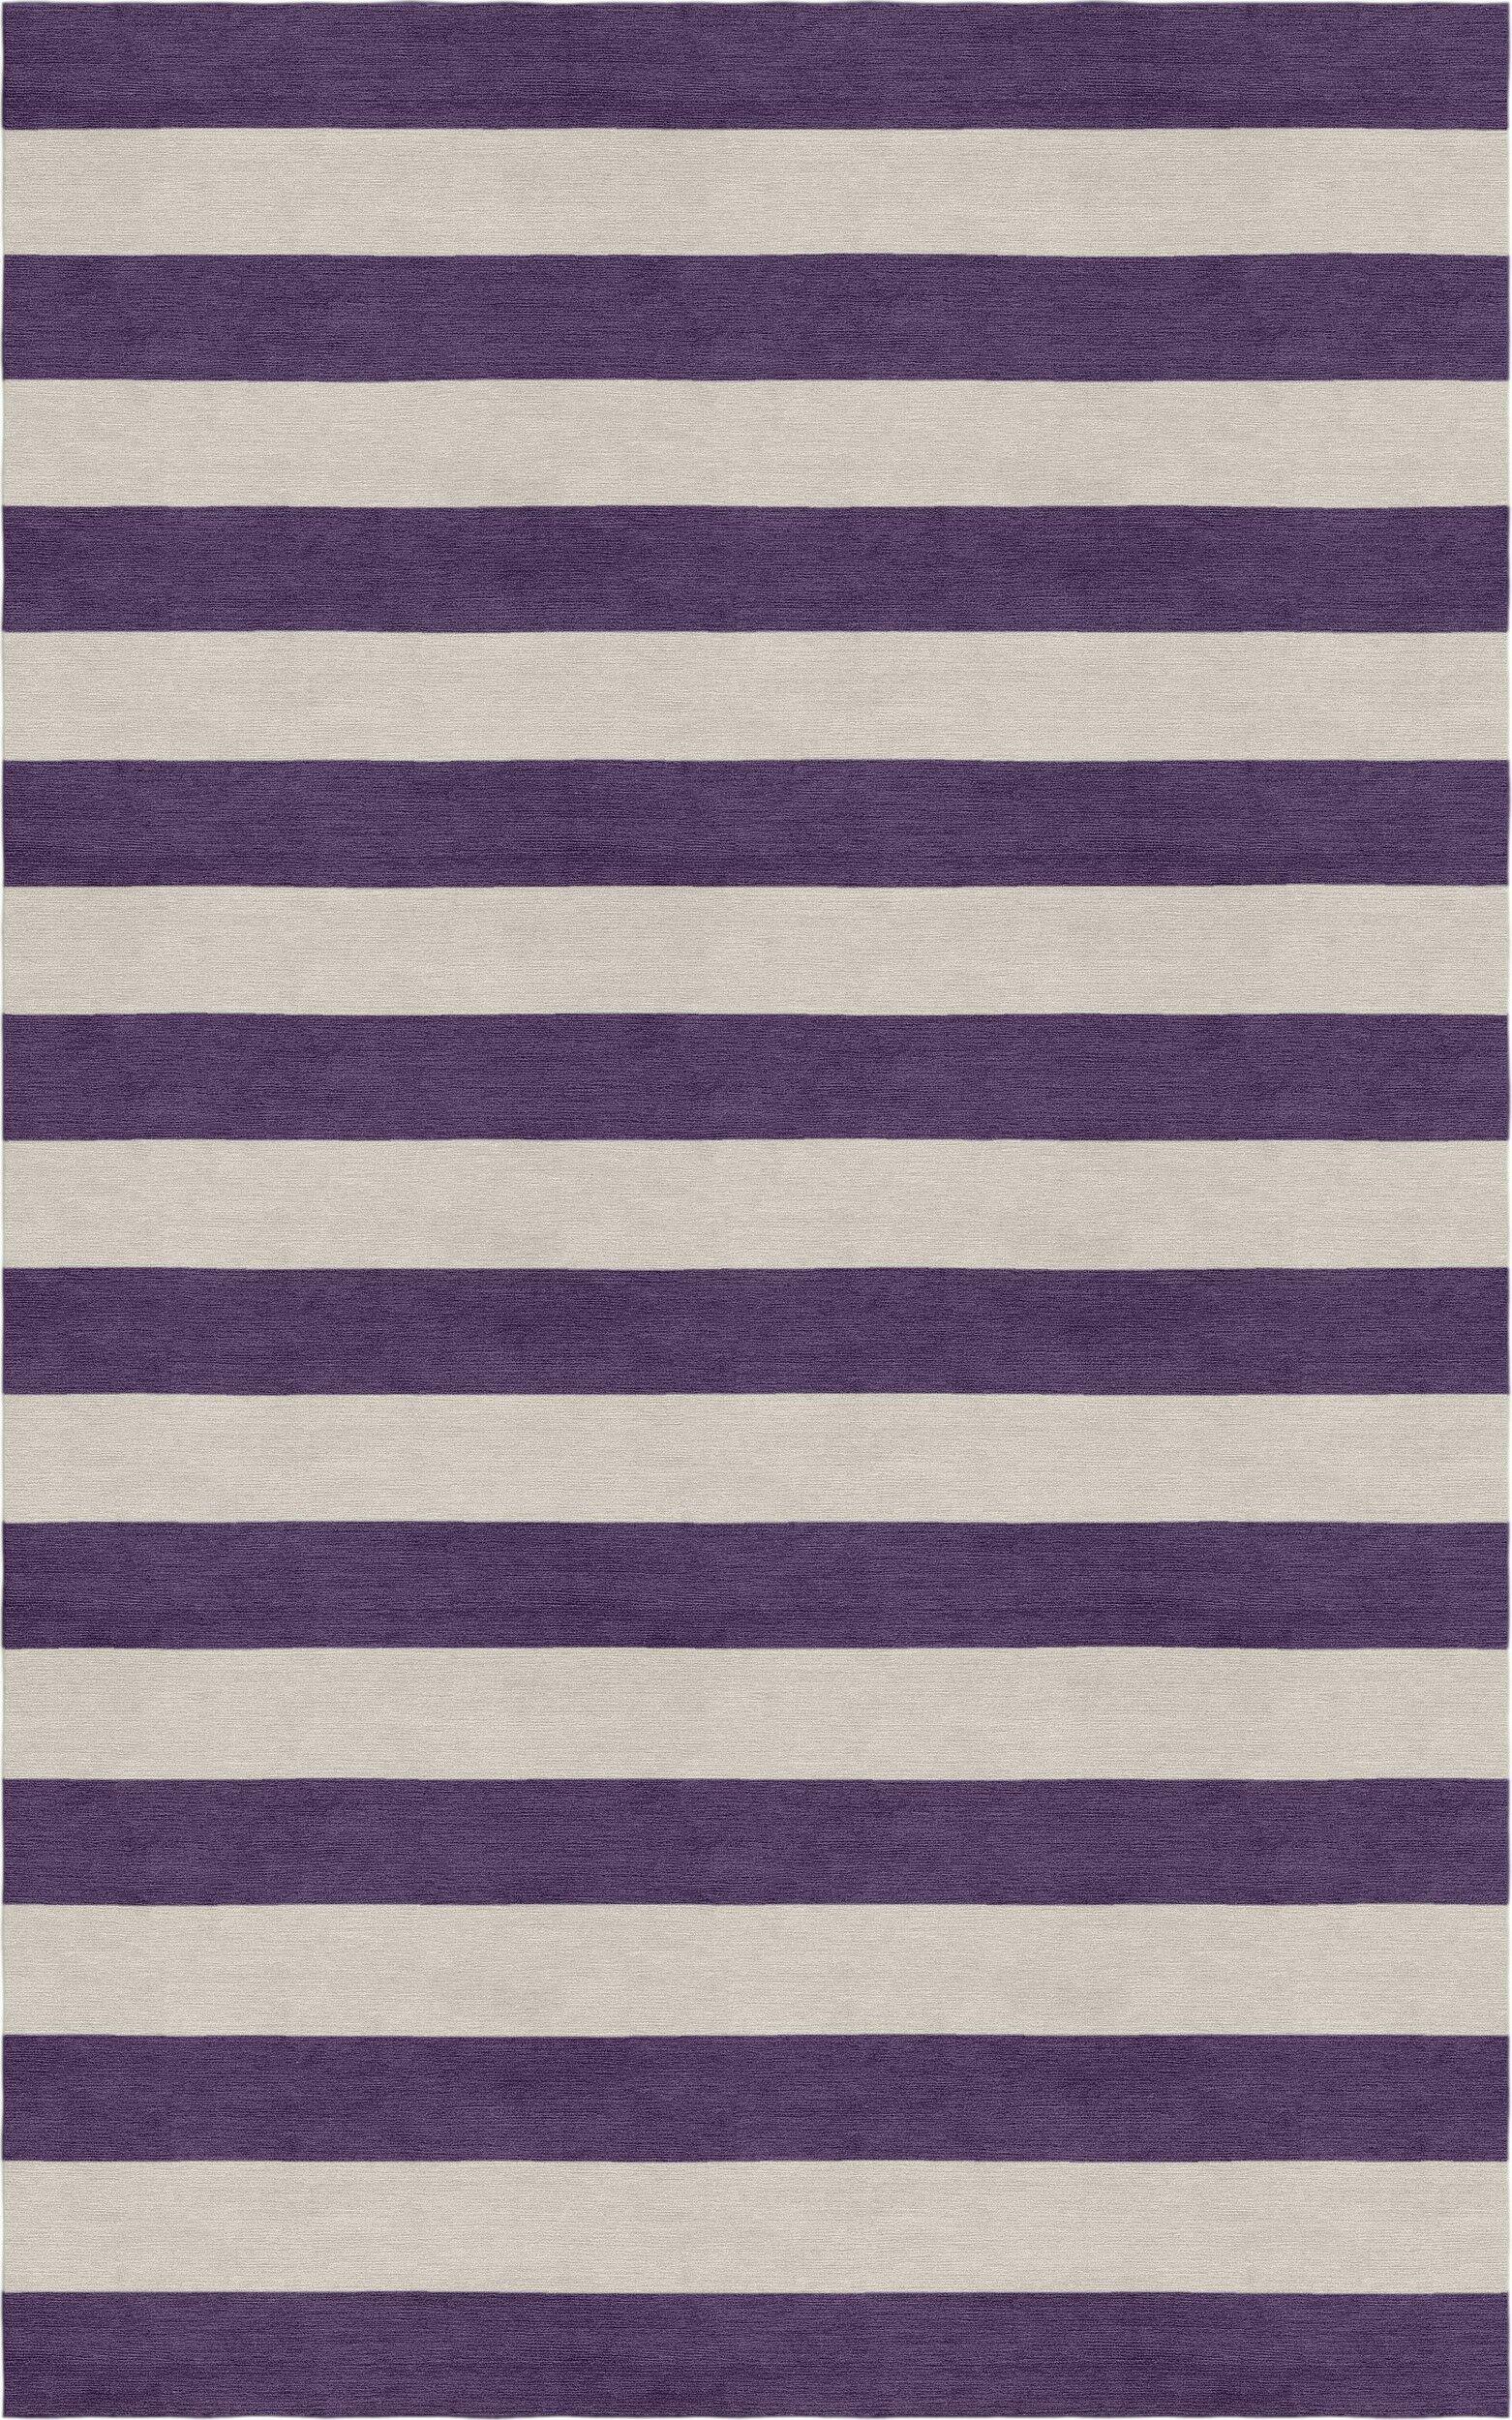 Mellott Stripe Hand-Woven Wool Silver/Dark Violet Area Rug Rug Size: Rectangle 9' x 12'